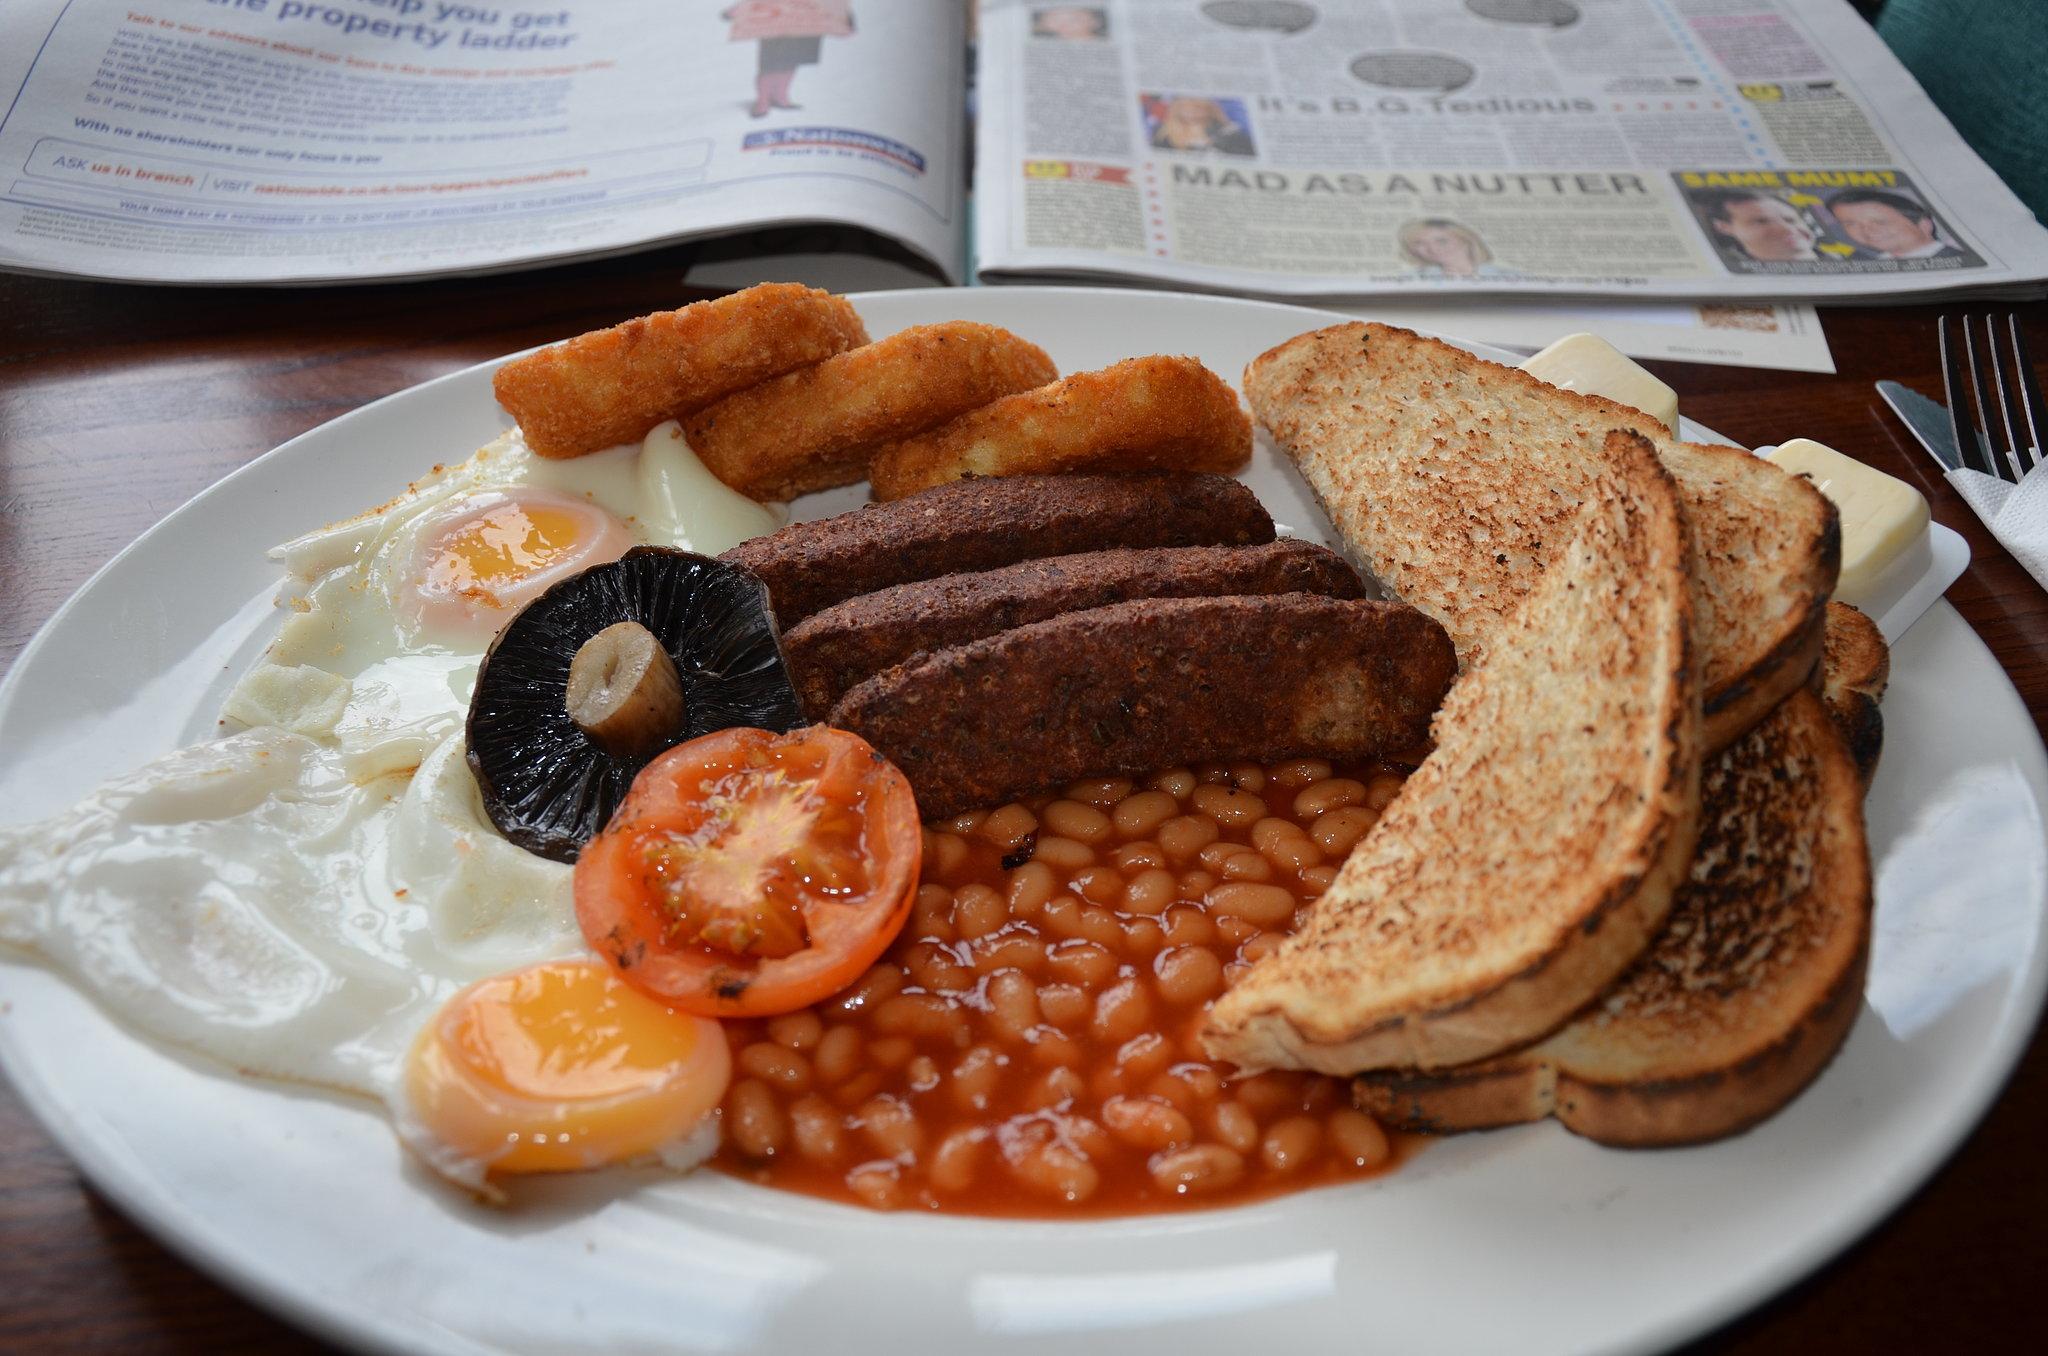 England full english breakfast eat your way through europe popsugar food - Petit dejeuner pauvre en glucides ...